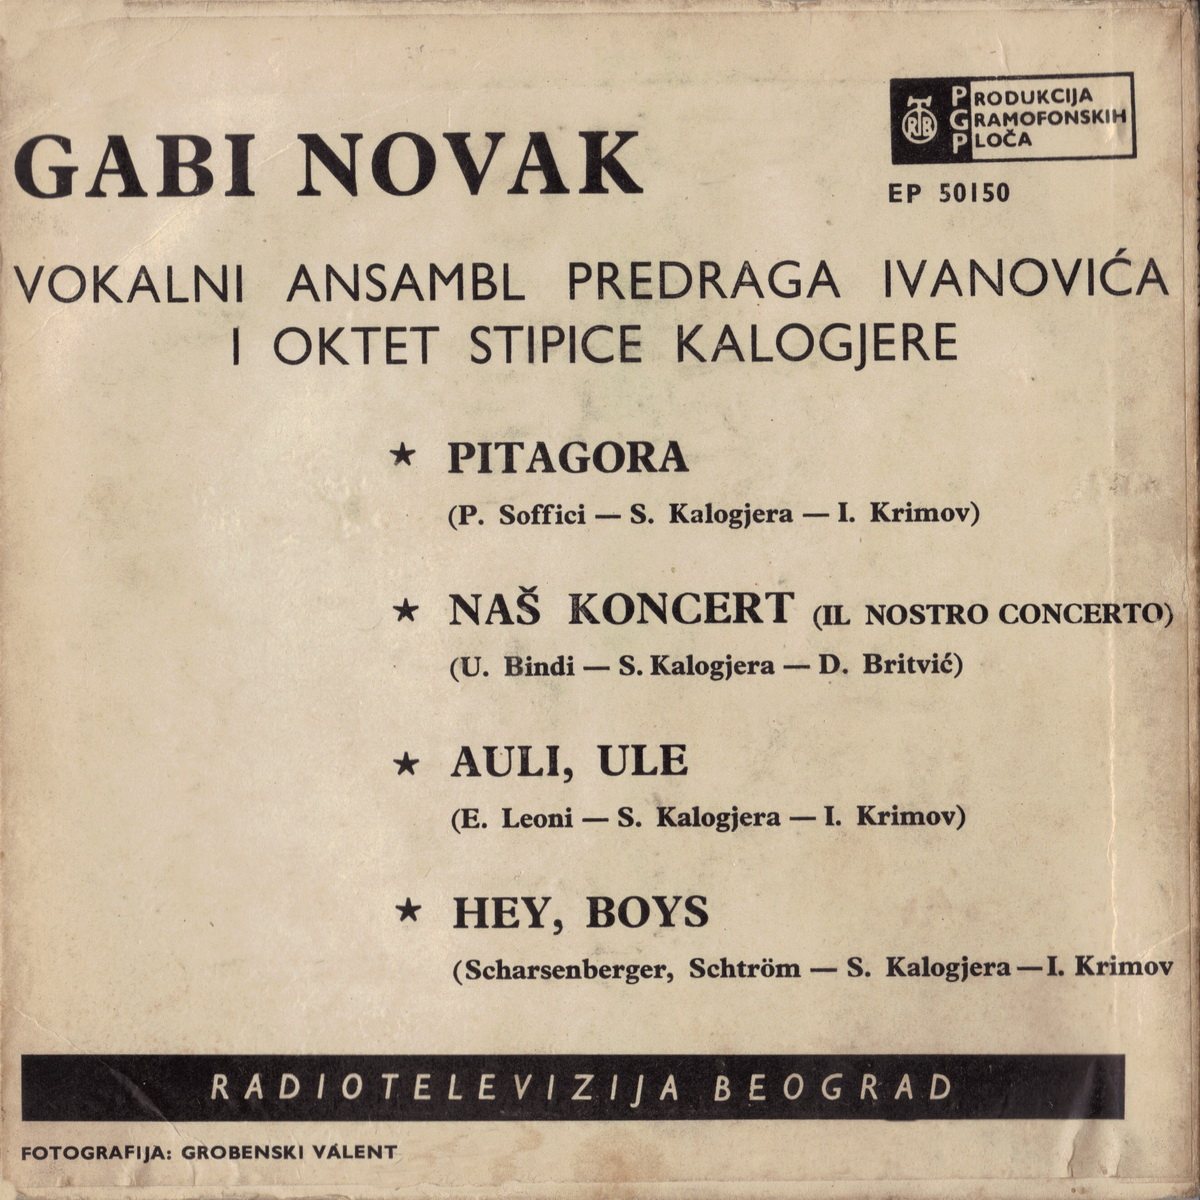 Gabi Novak 1962 Pitagora B